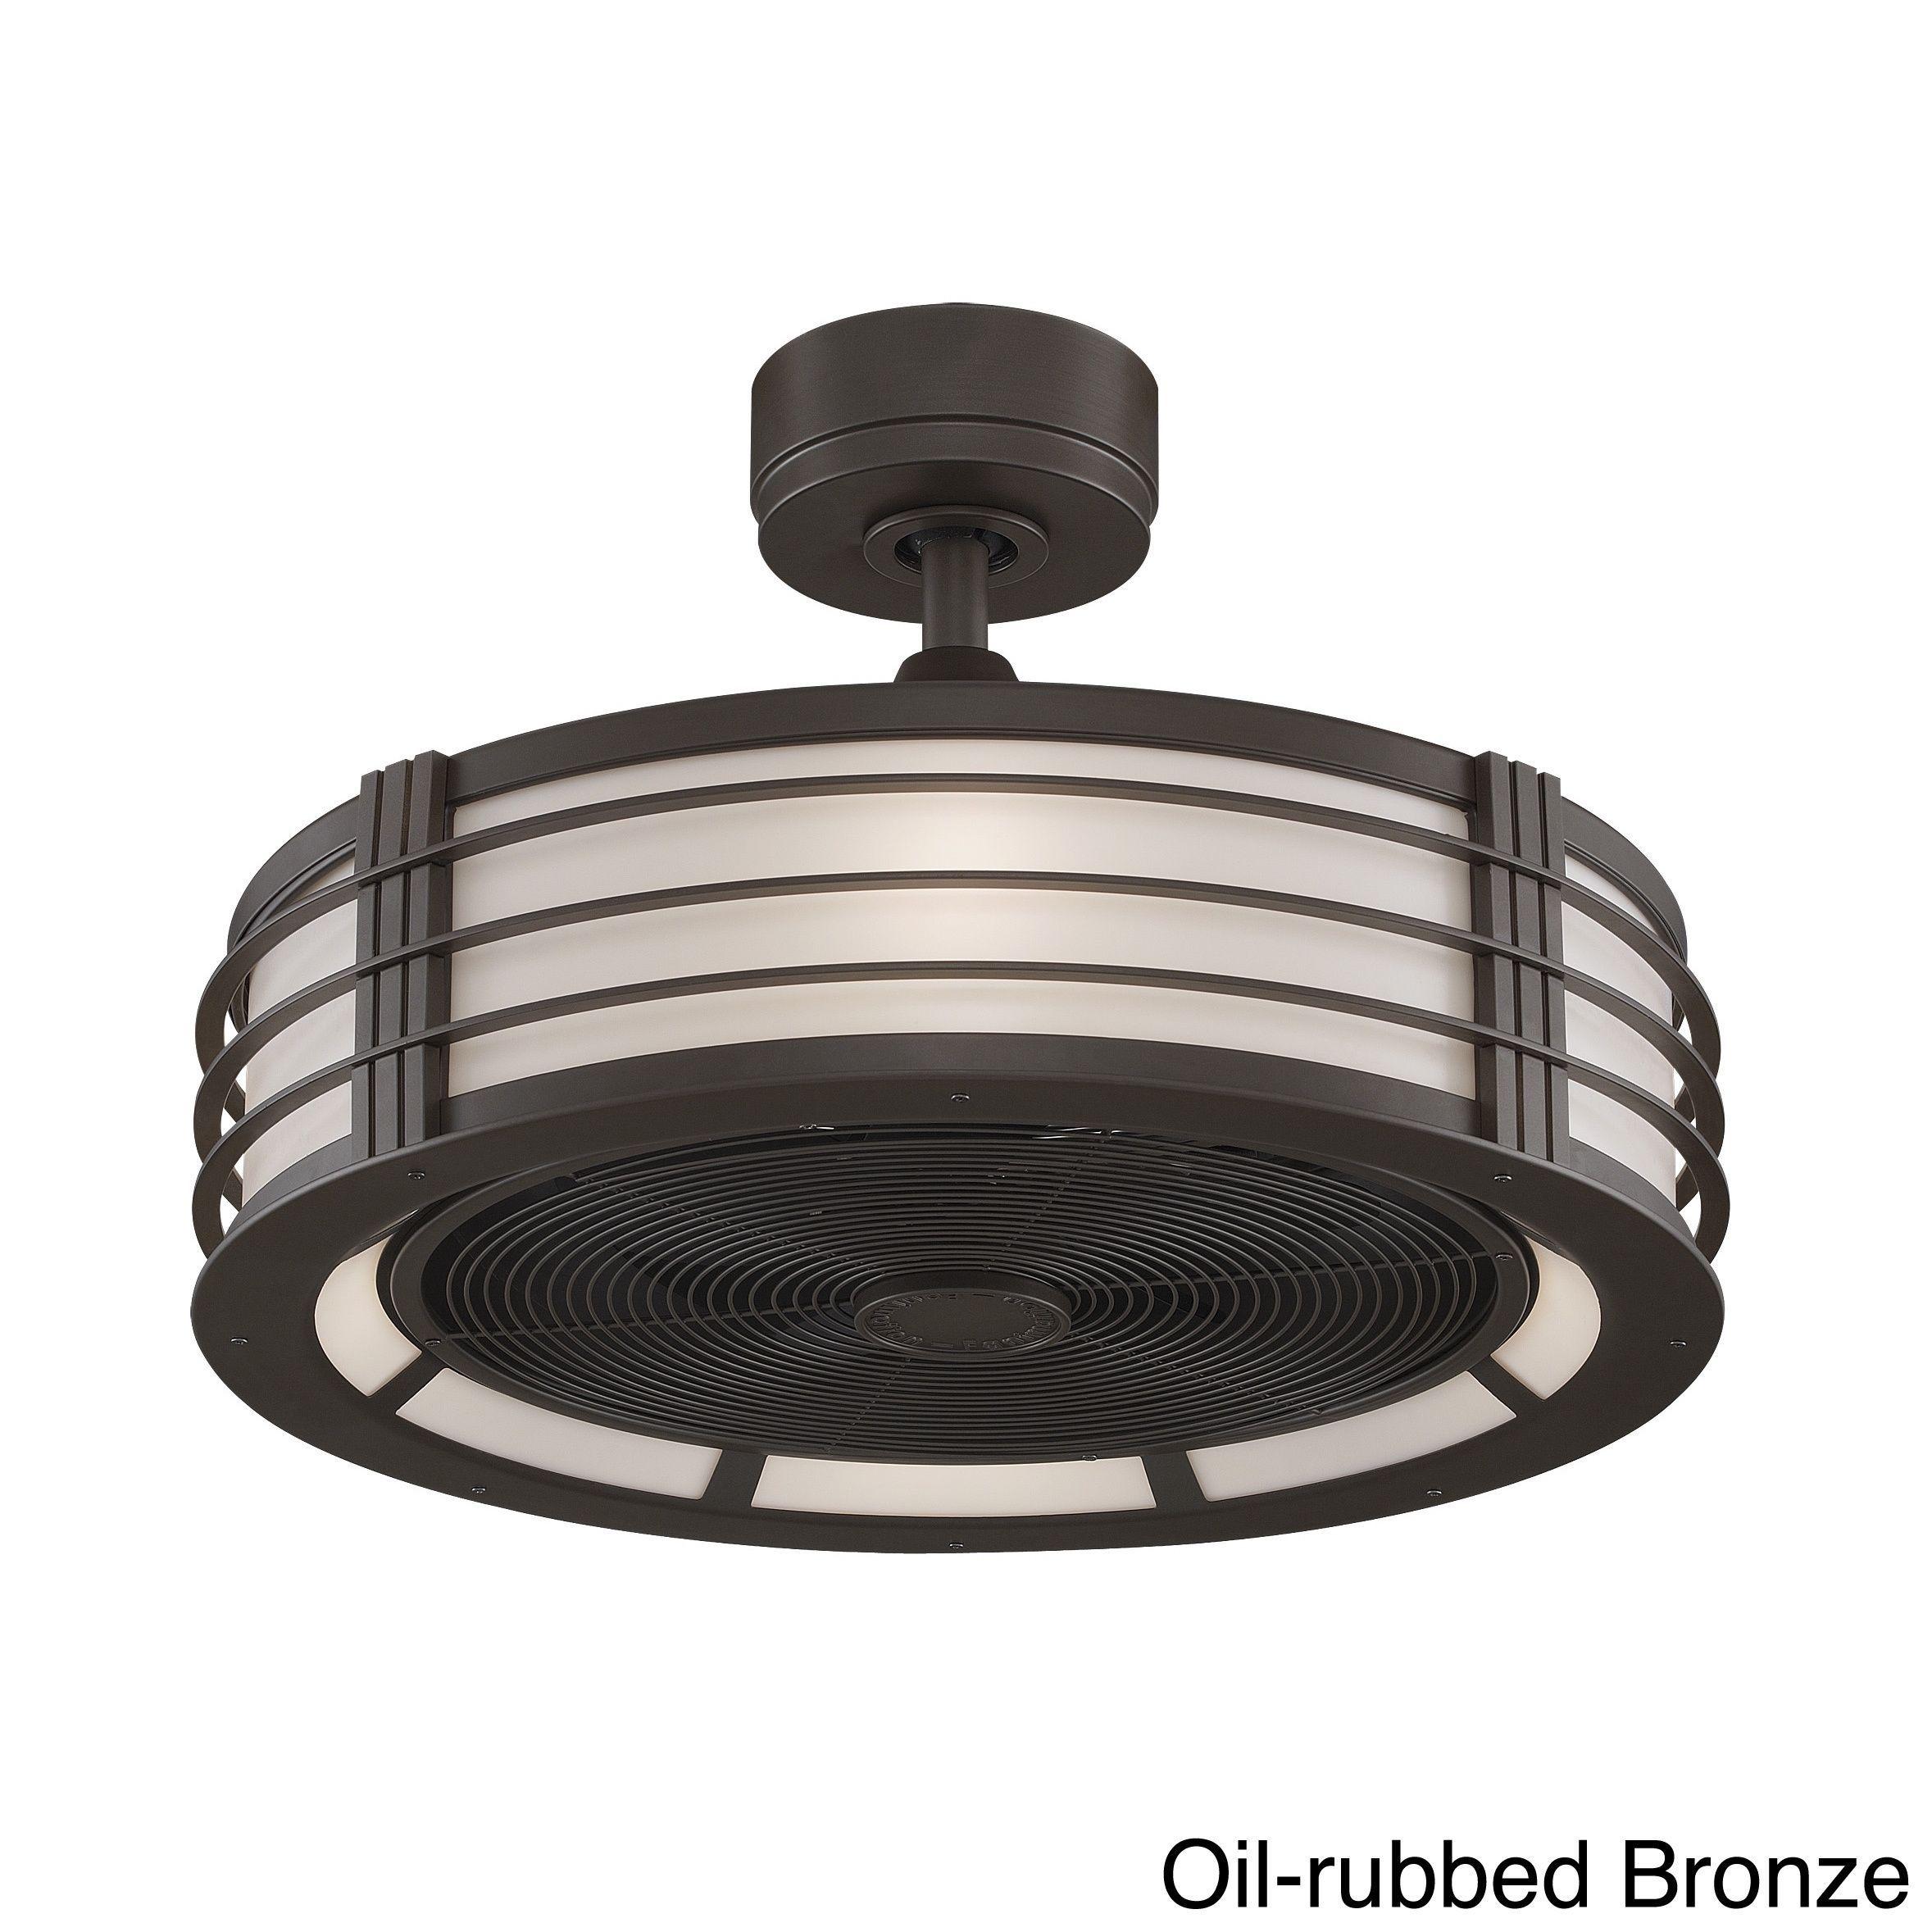 Fanimation Beckwith 12.5-inch 4-light Ceiling Fan (